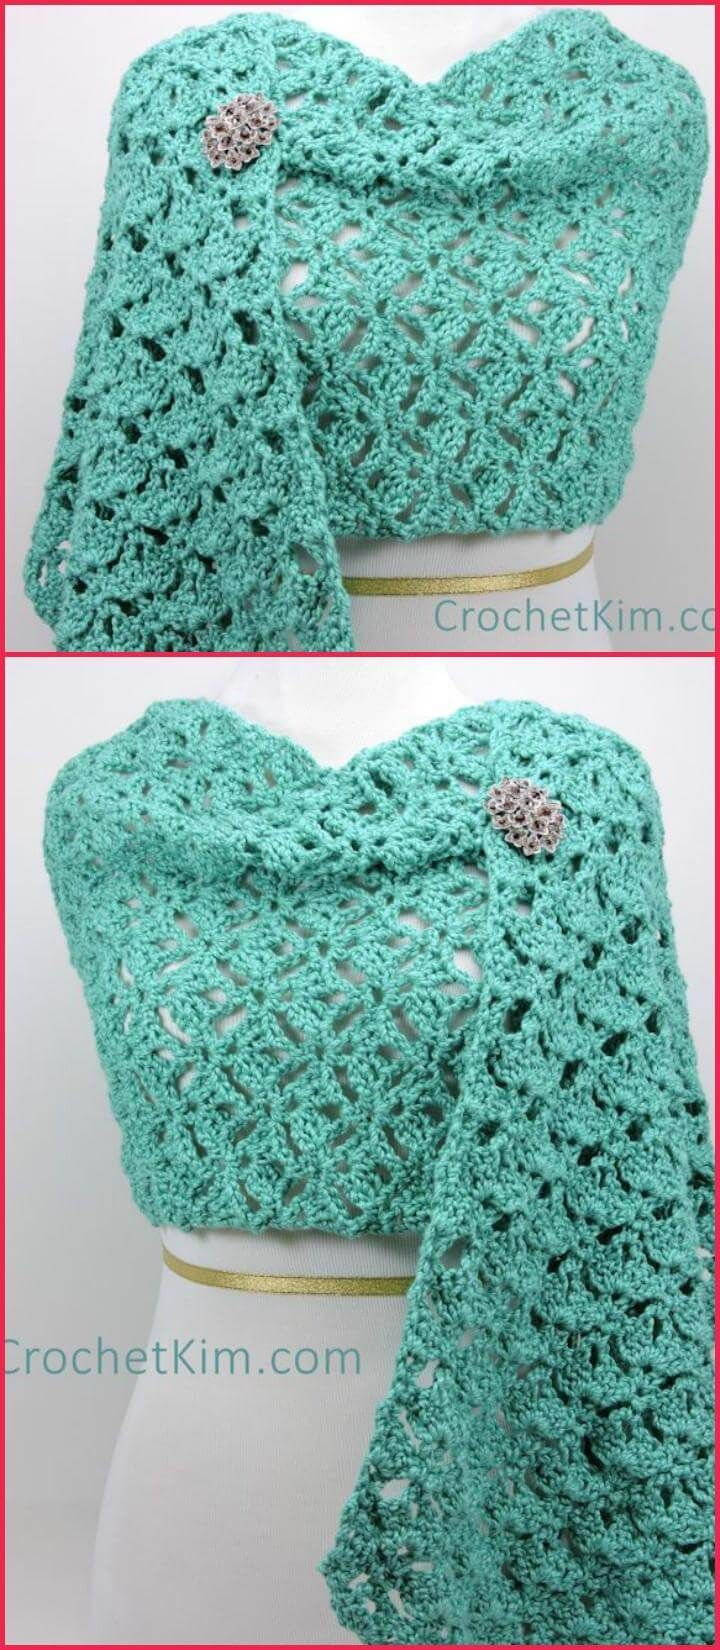 100 Free Crochet Shawl Patterns - Free Crochet Patterns - Page 9 of 19 - DIY & Crafts